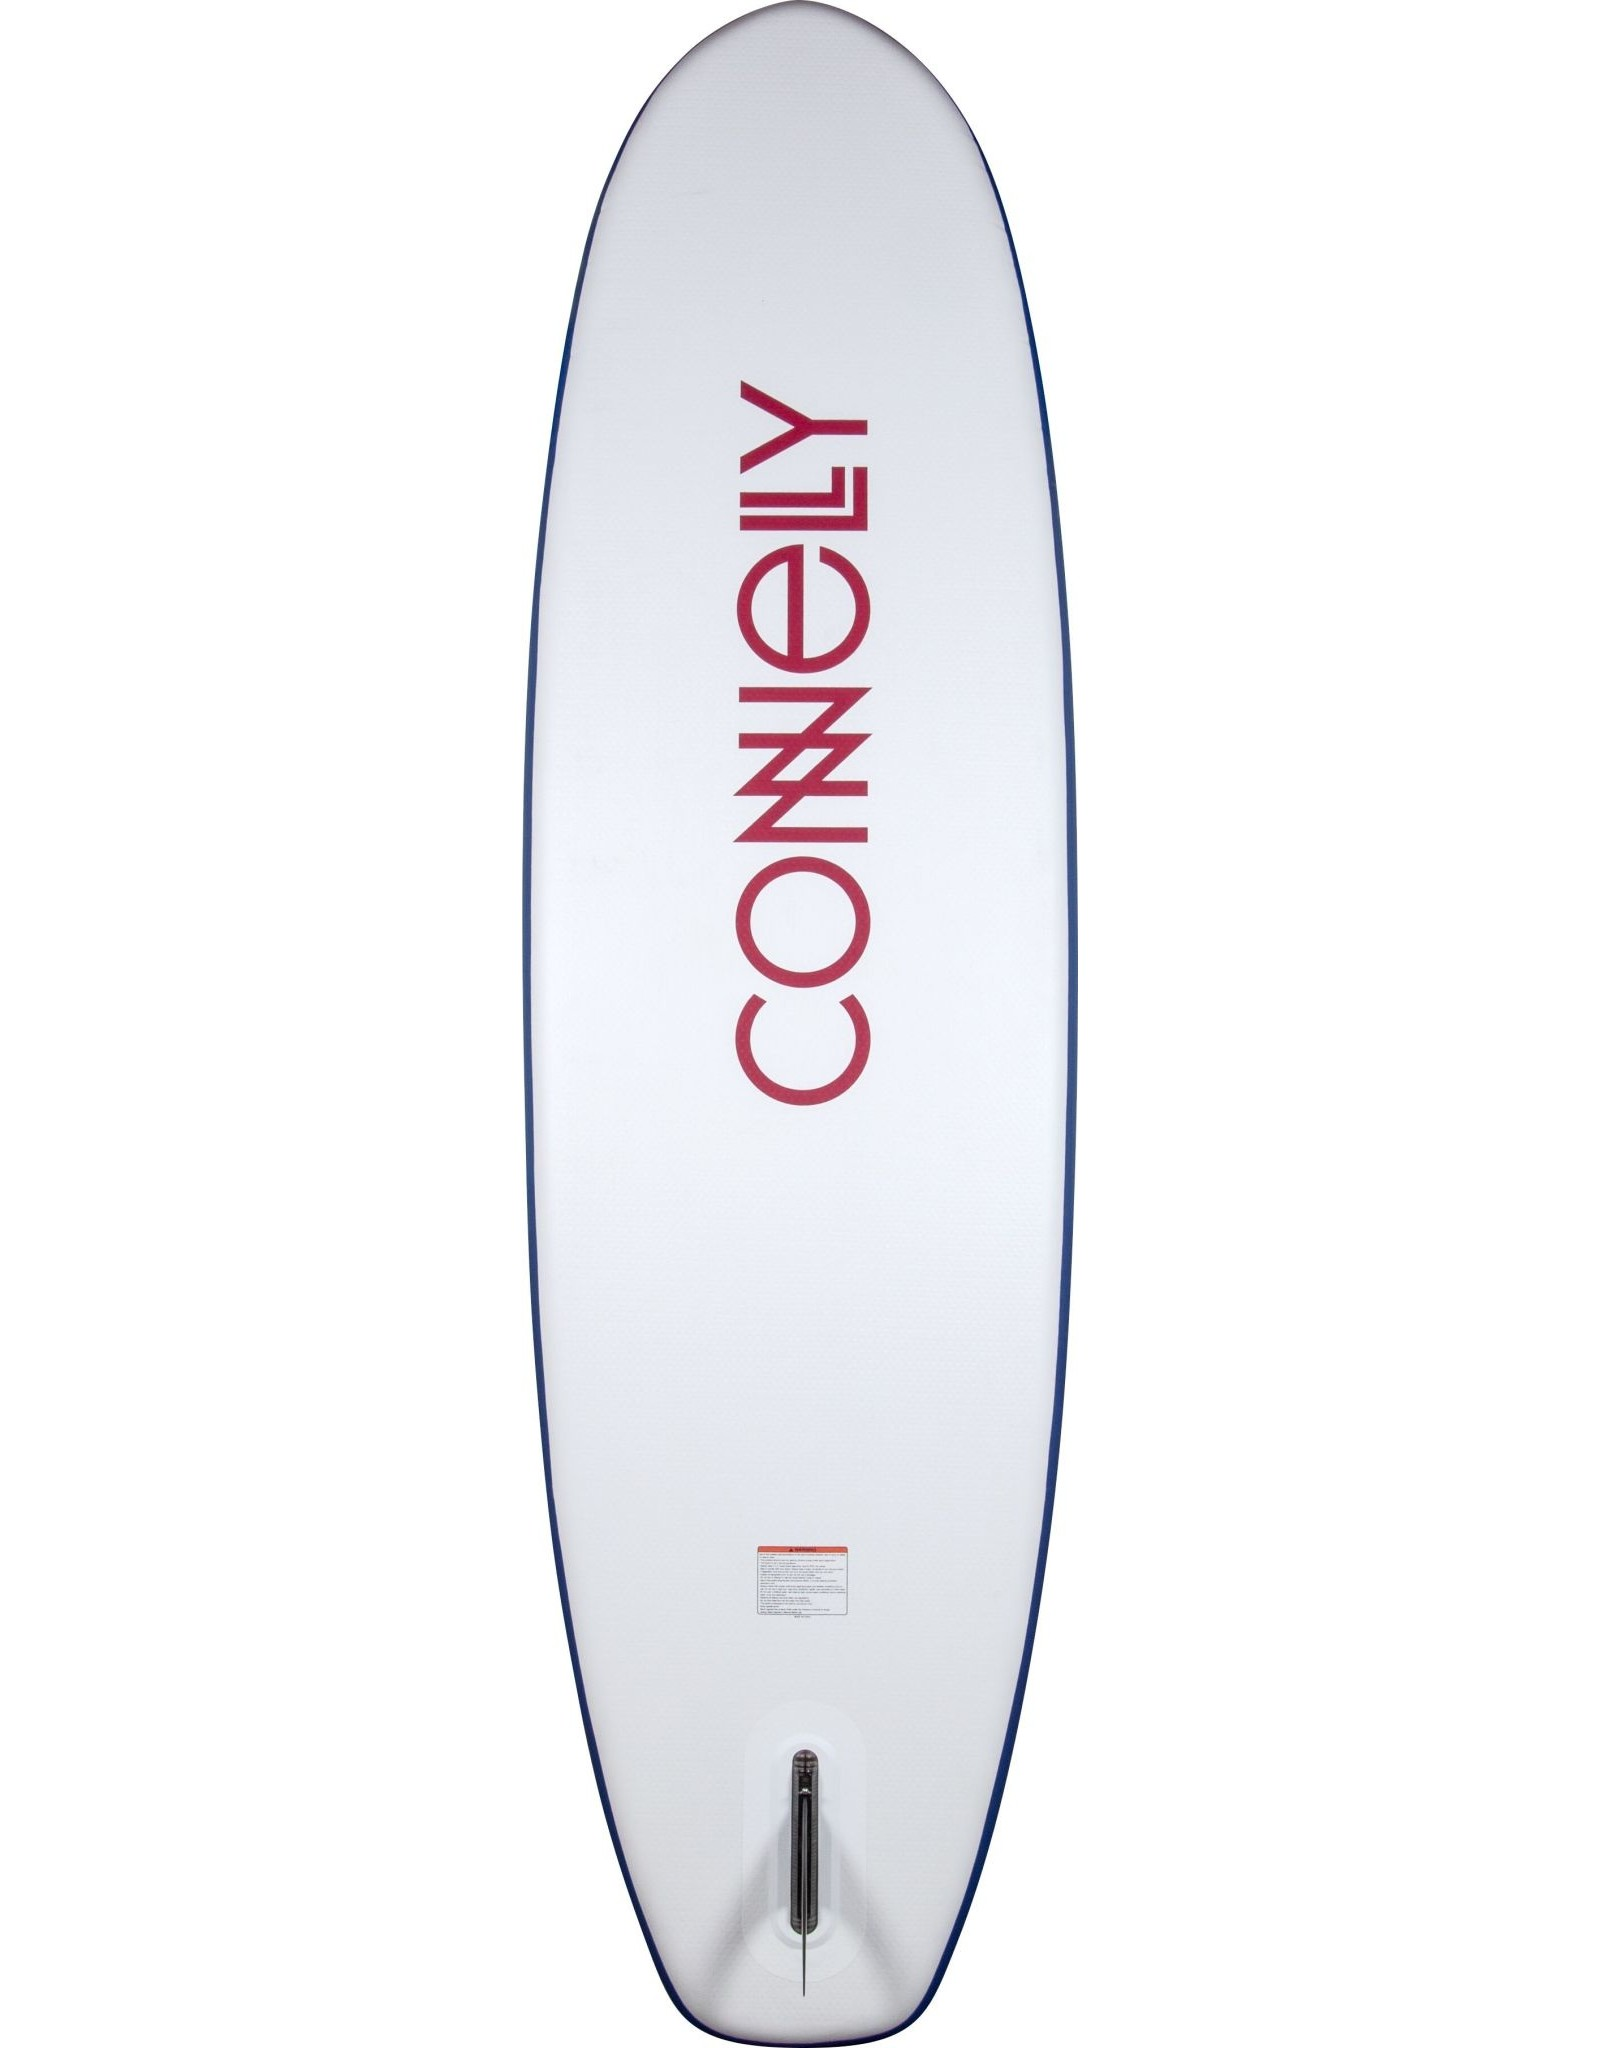 "Connelly 10'6"" DAKOTA iSUP"